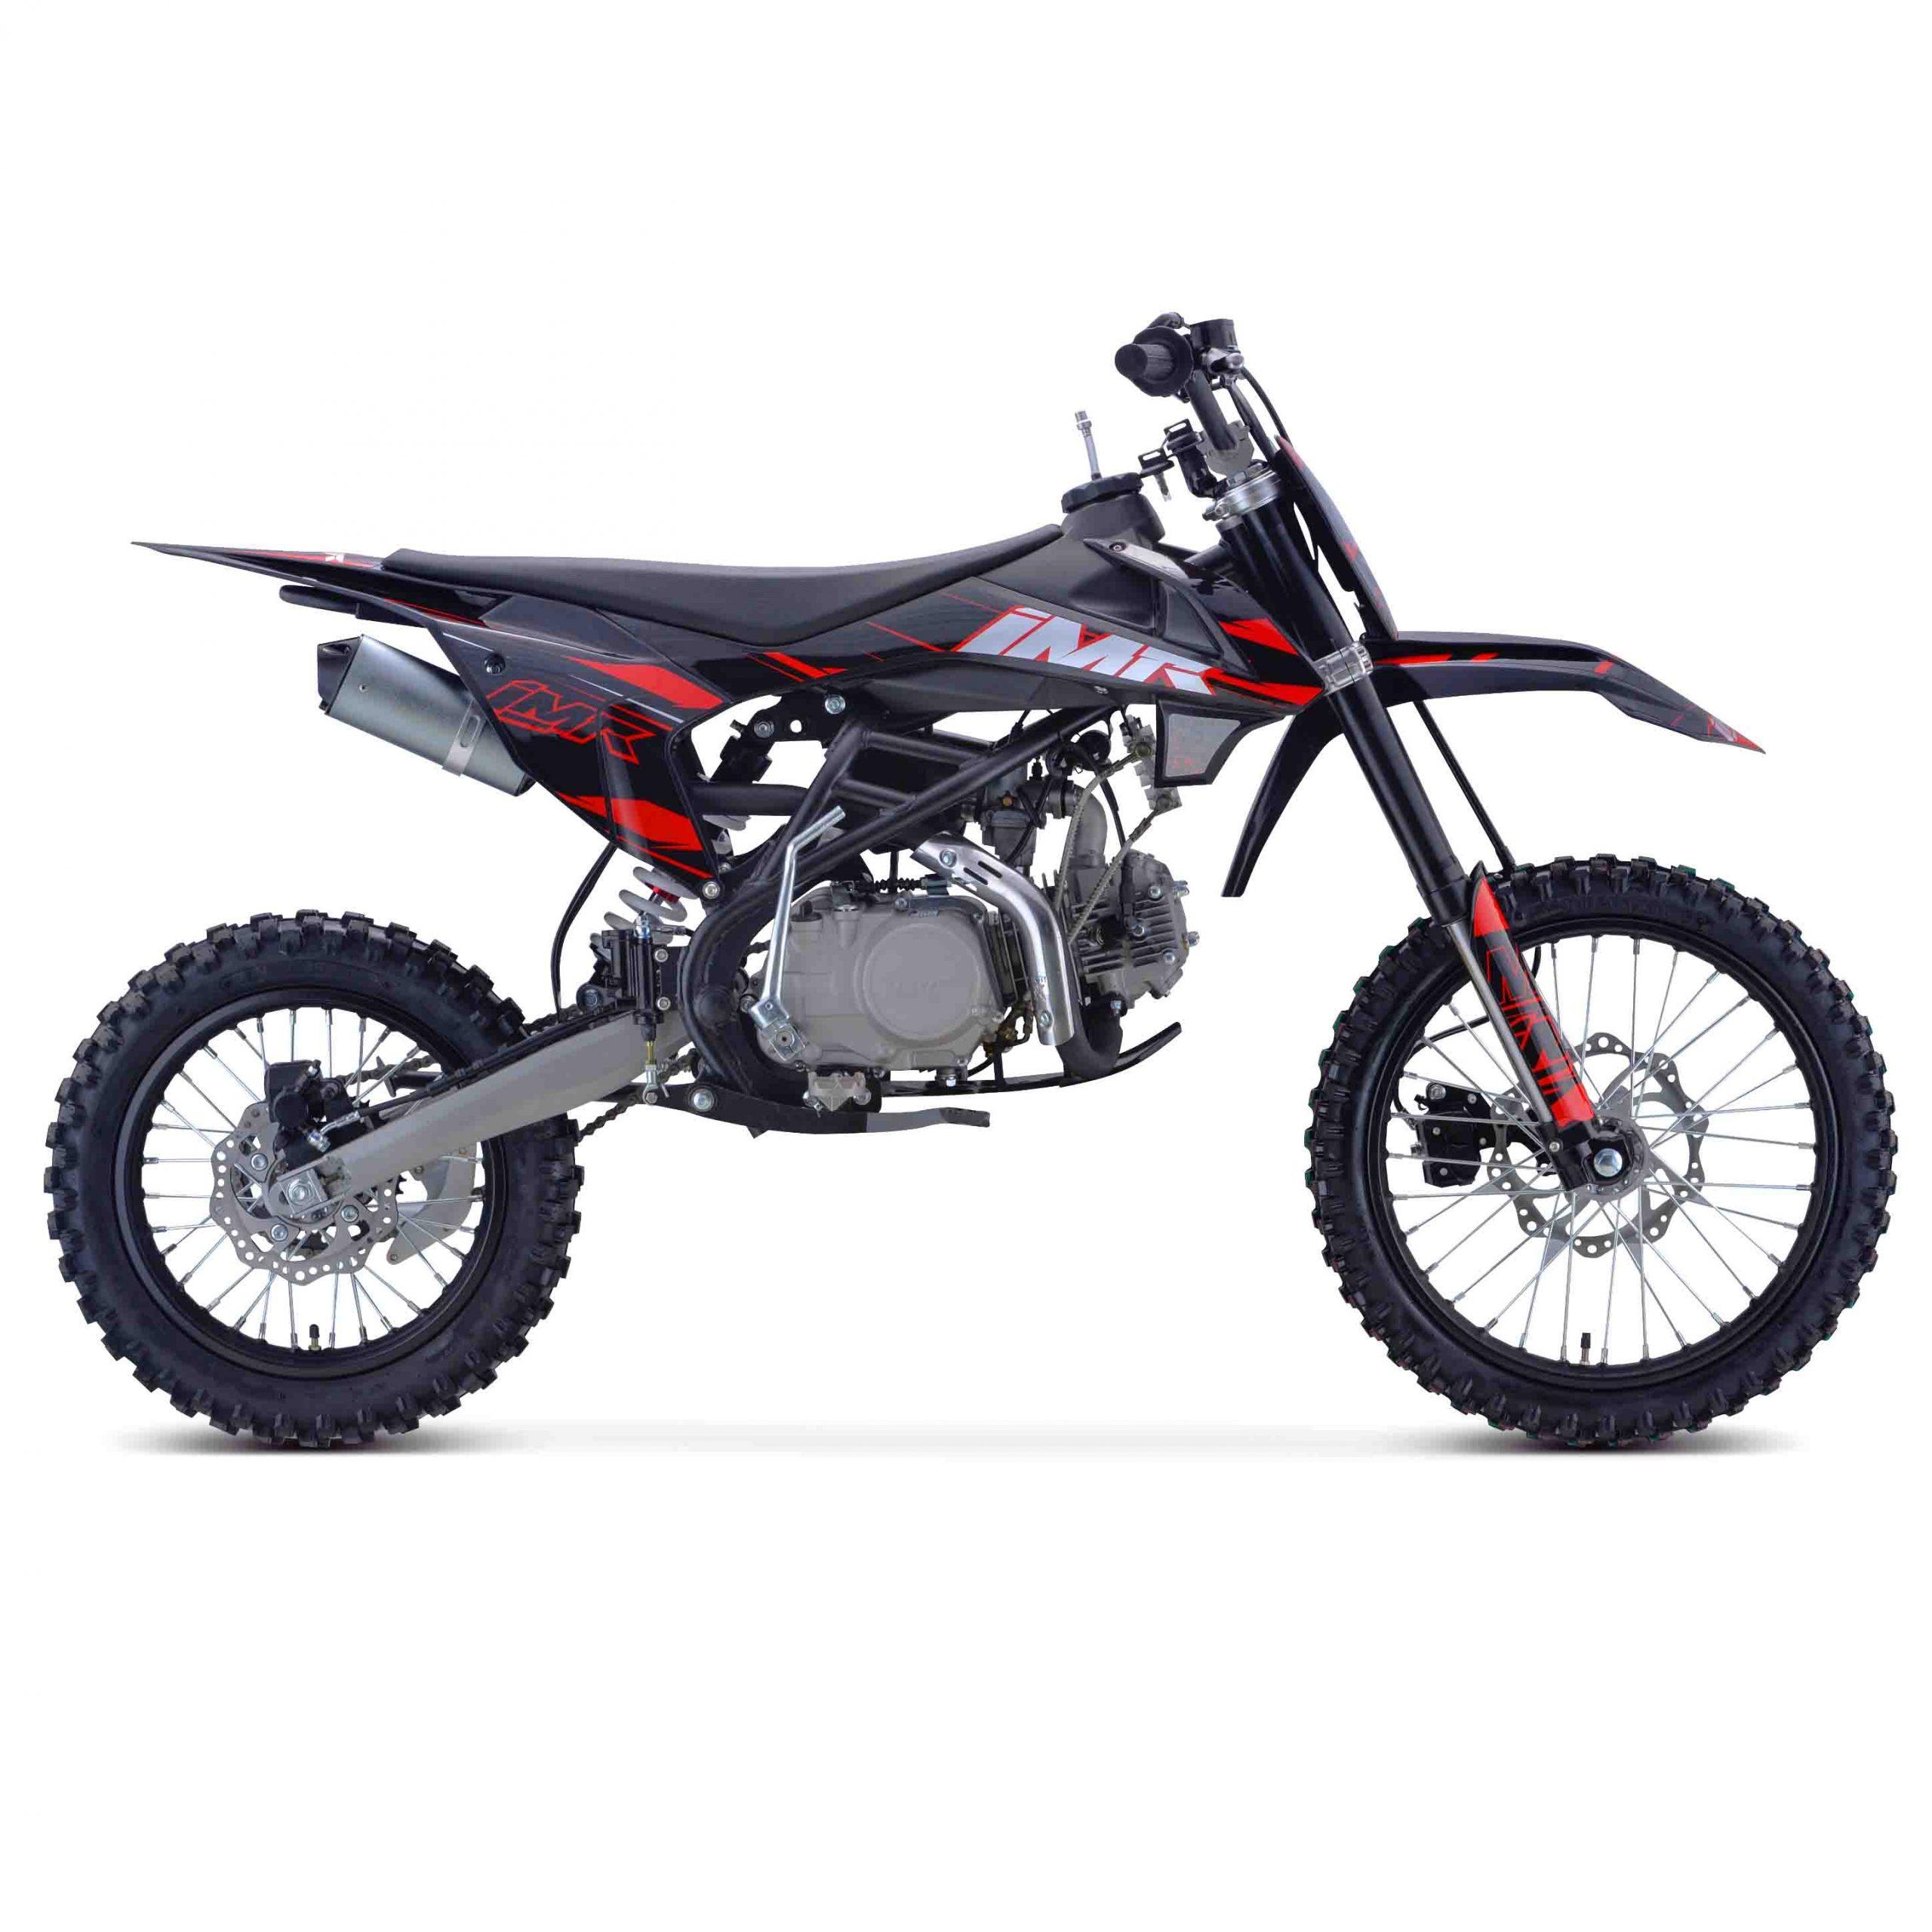 Pitbike-cross-imr-140-rojo-4.jpg